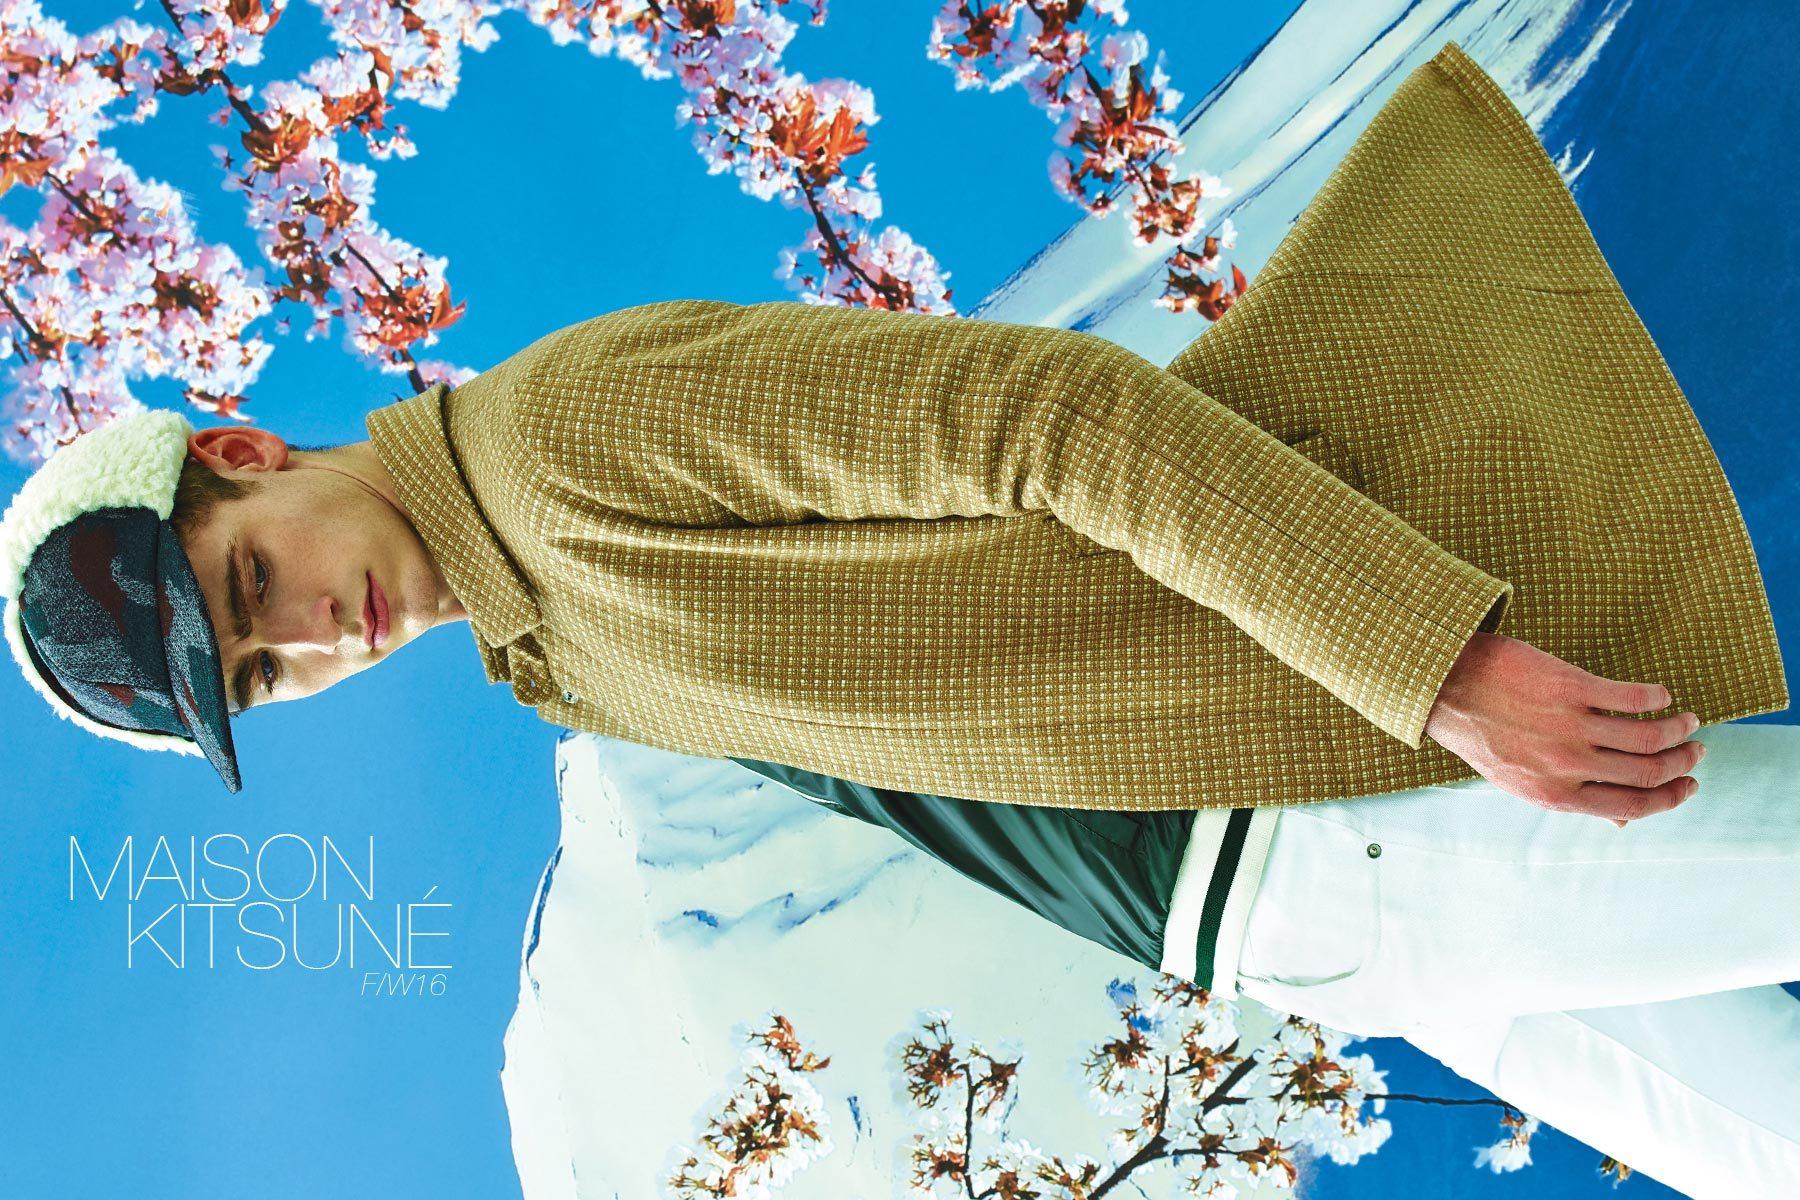 The latest Maison Kitsuné menswear lookbook, for F/W16, by photographer Pierpaolo Ferrari. Pony boy magazine NY.